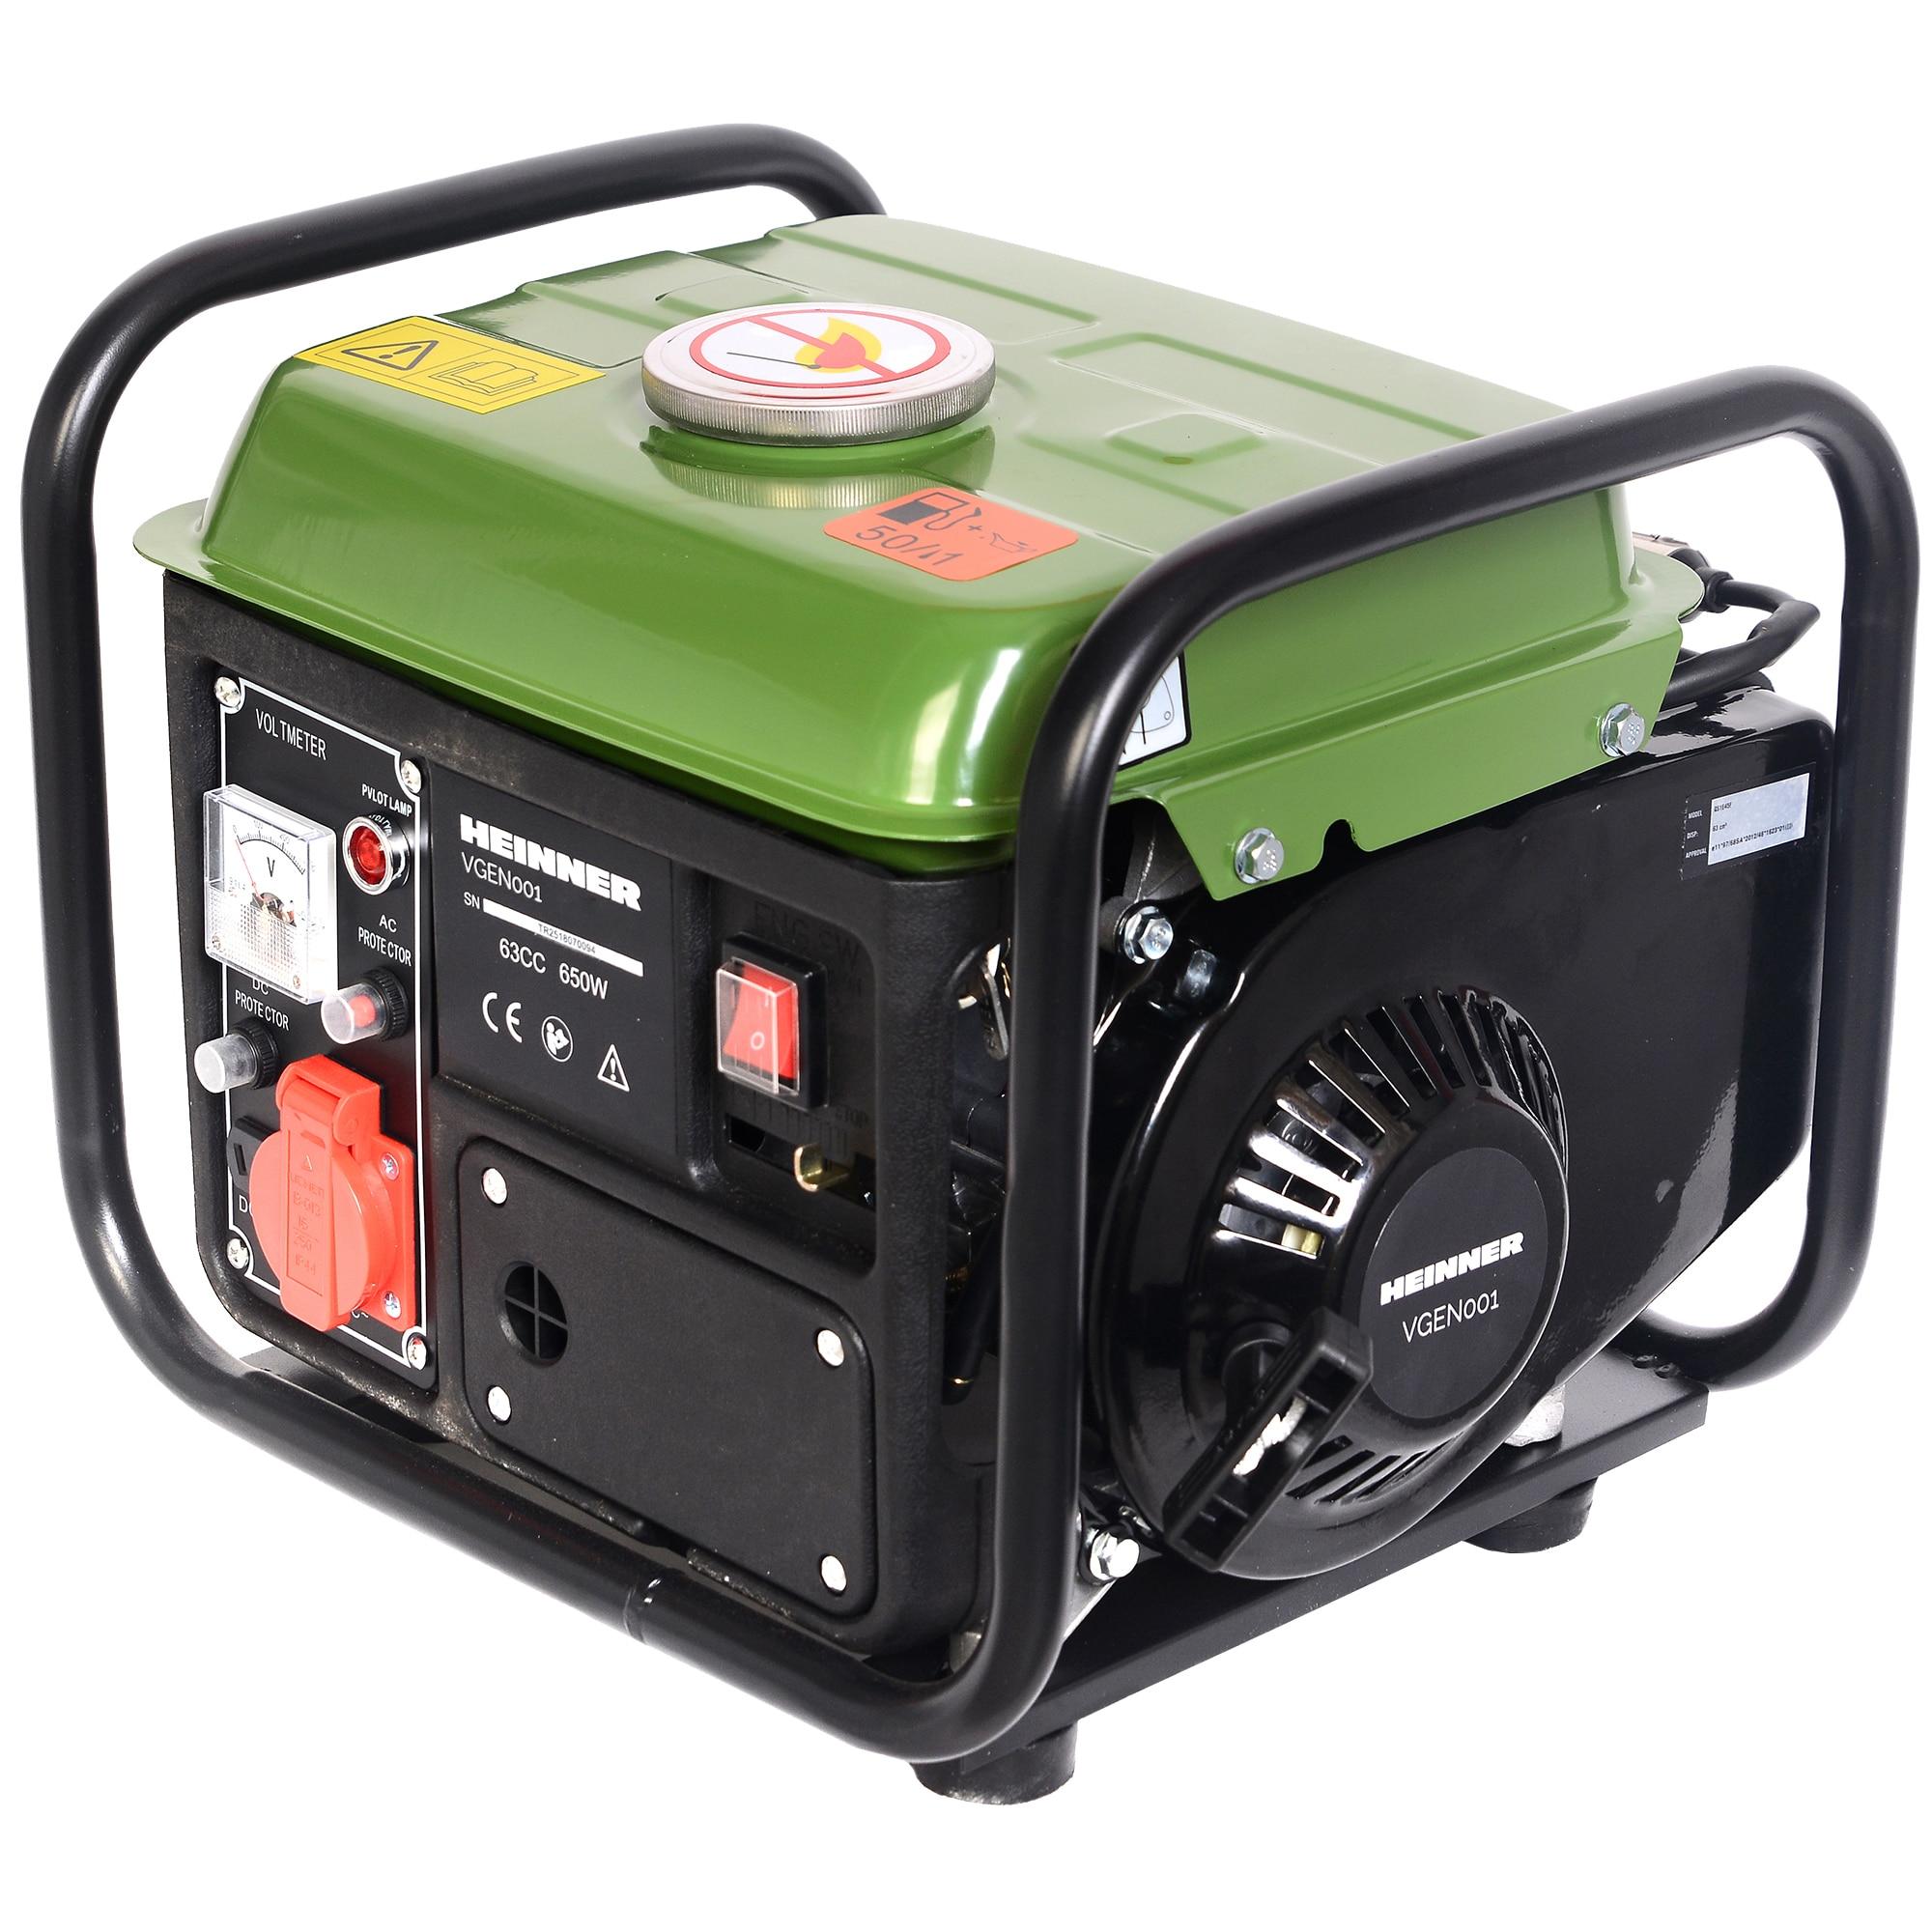 Fotografie Generator Heinner VGEN001, 650 W, 63 CC, 230 V, 2 timpi, 4 l, benzina, 6 h autonomie amxima